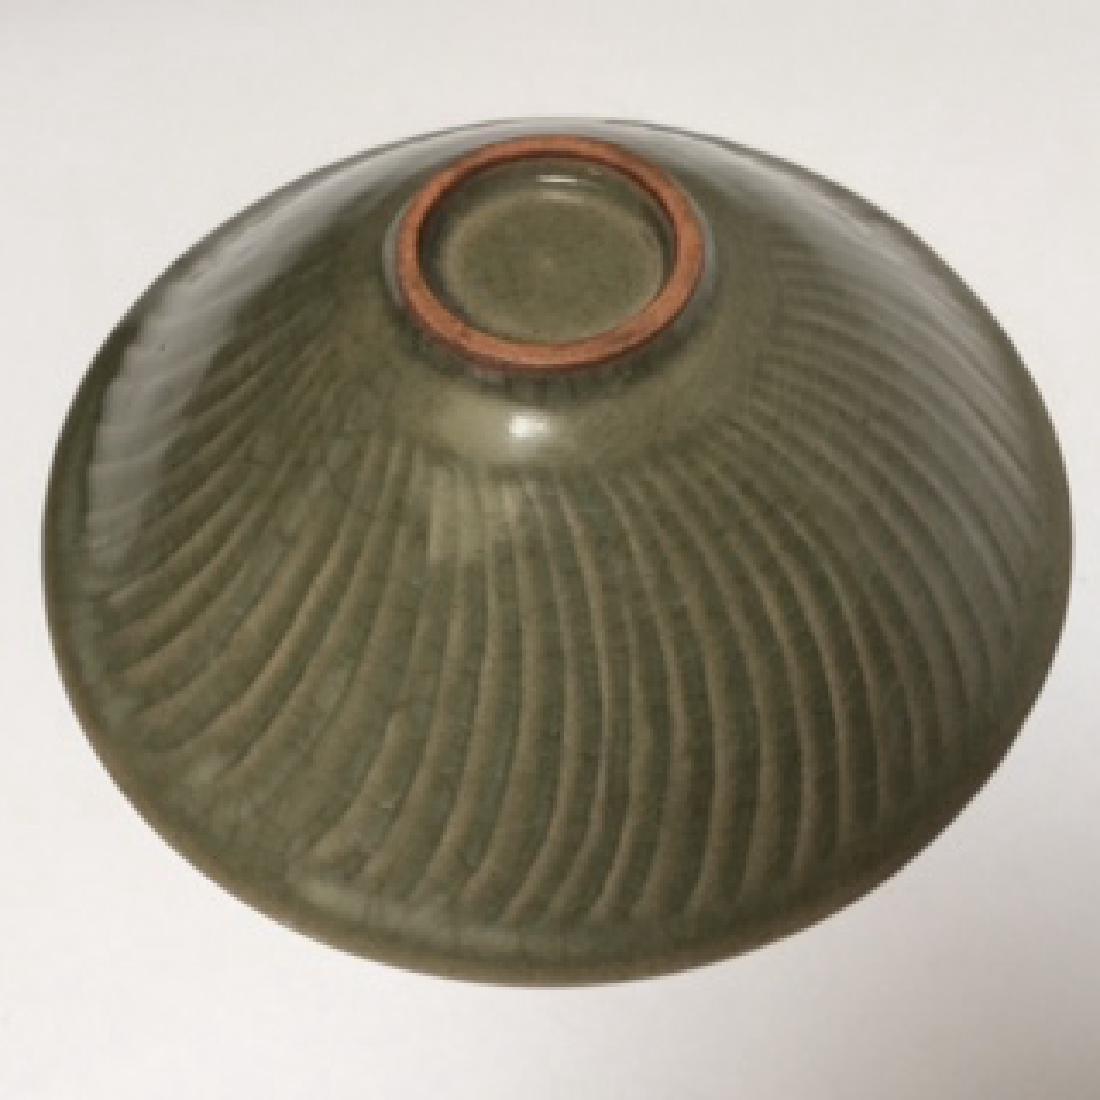 Yao Zhou Ware PorcelainGreen, 3 Boys Decorated Bowl - 4